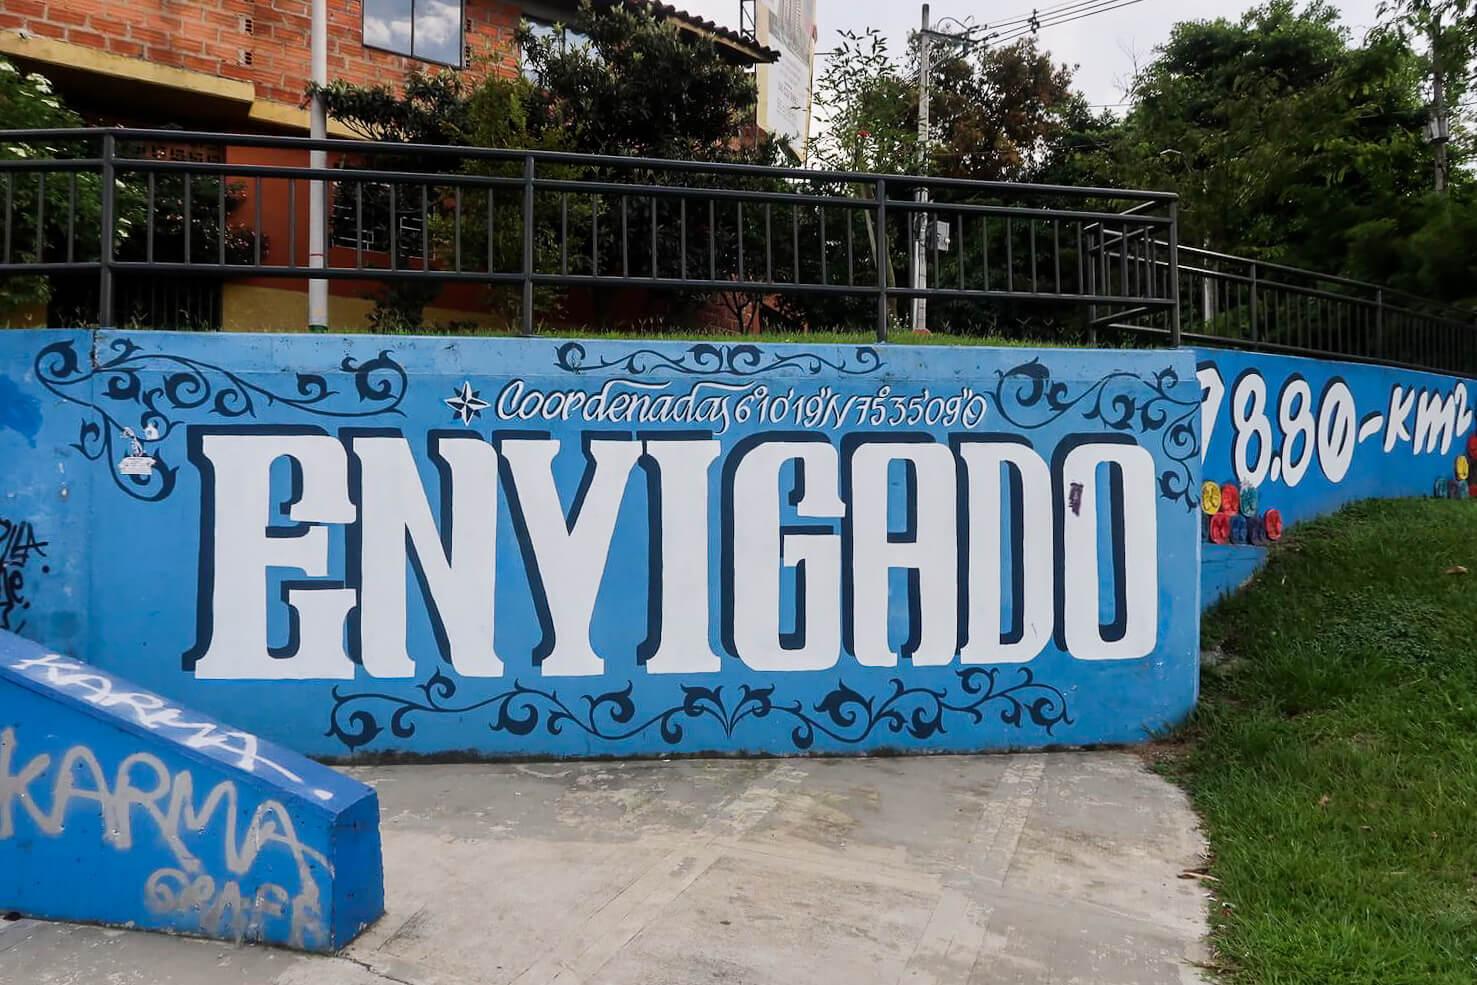 envigado-street-art